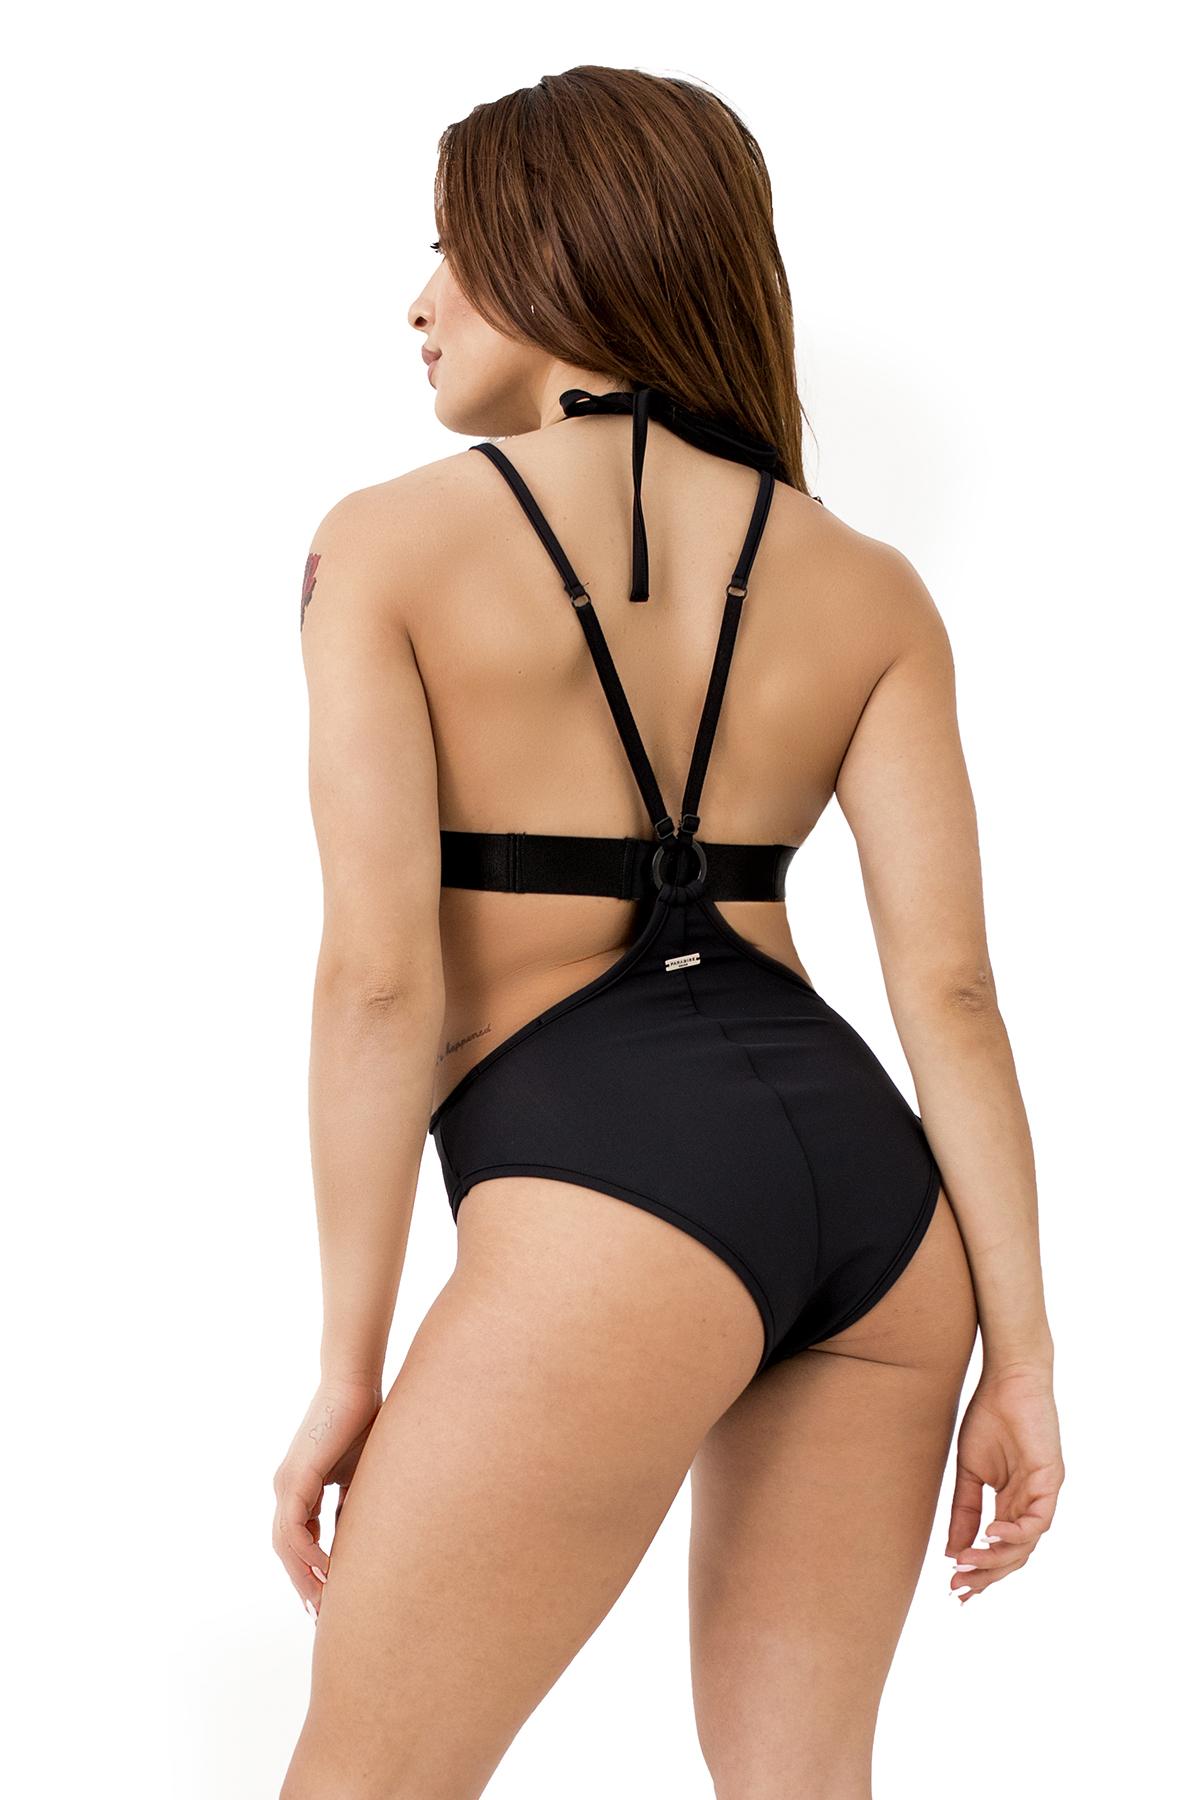 womankini black_bottom_1200x1800